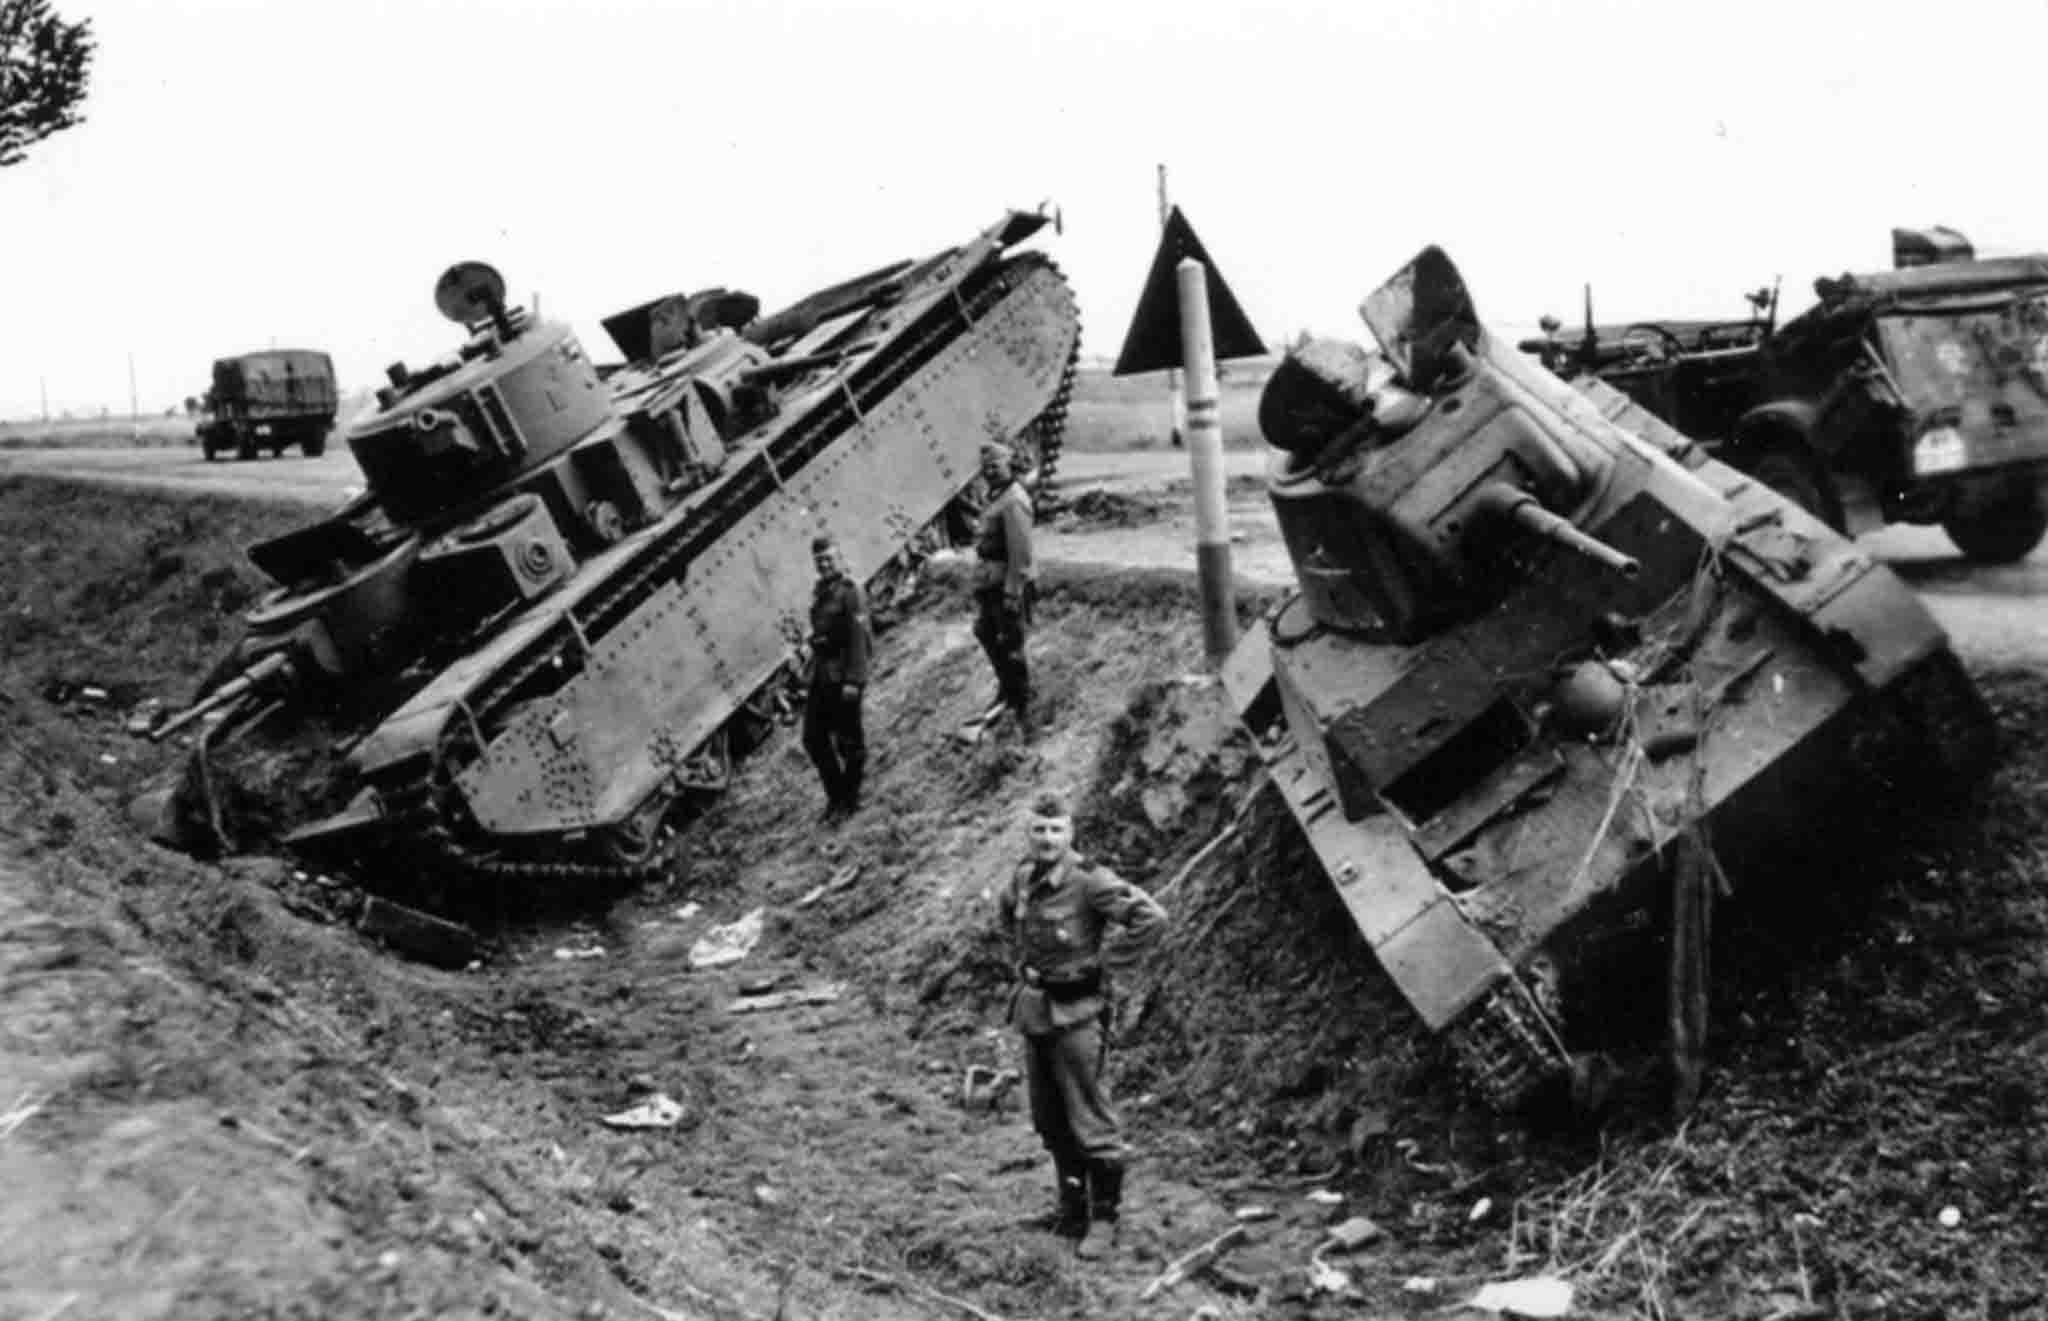 T-26, T-35